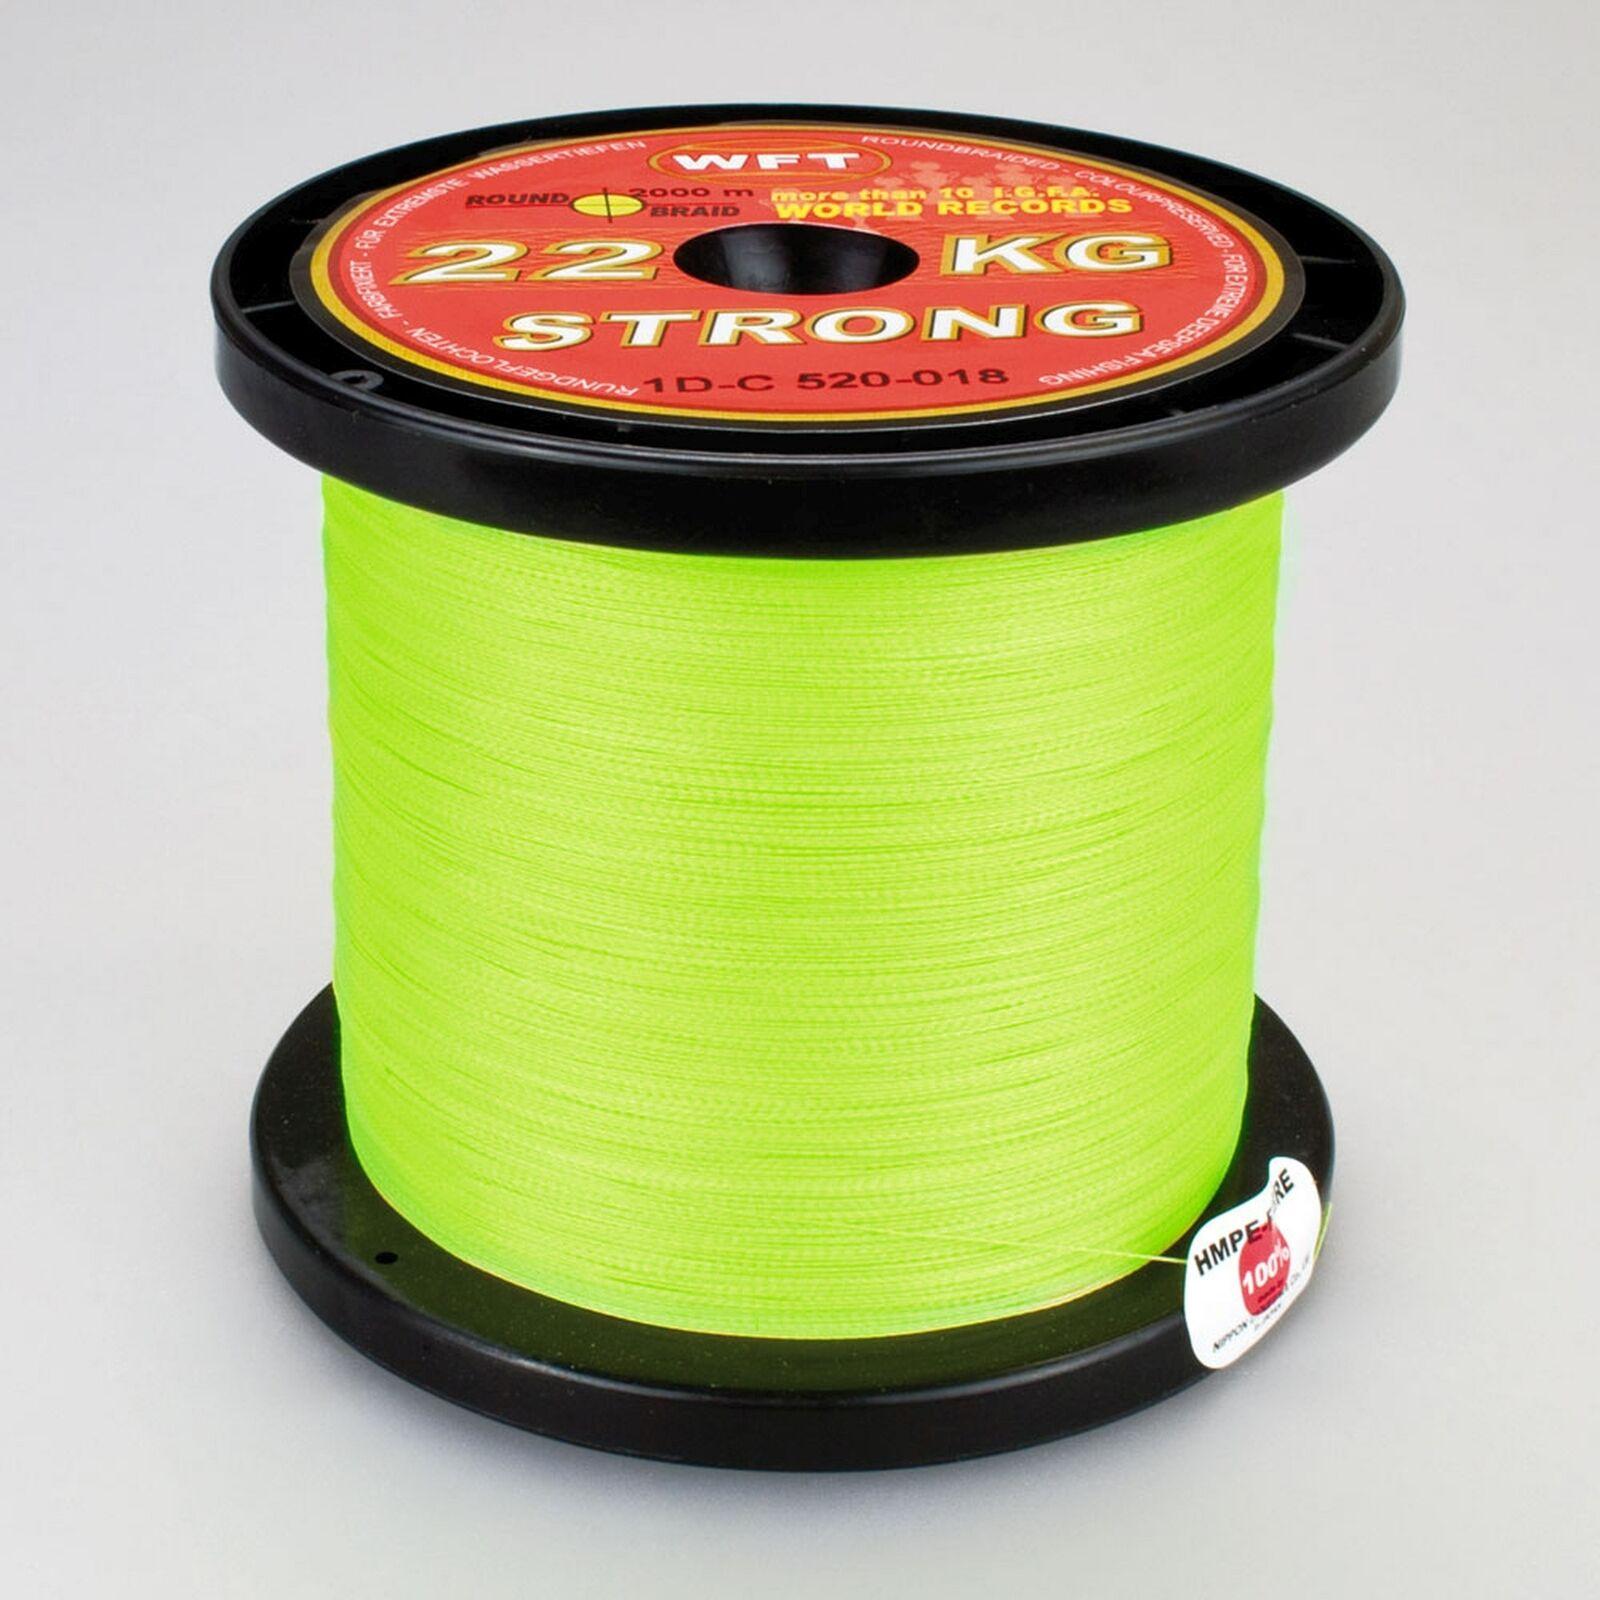 ( /m) WFT KG Strong Geflochtene Angelschnur Chartreuse 0,08-0,39mm 2000m